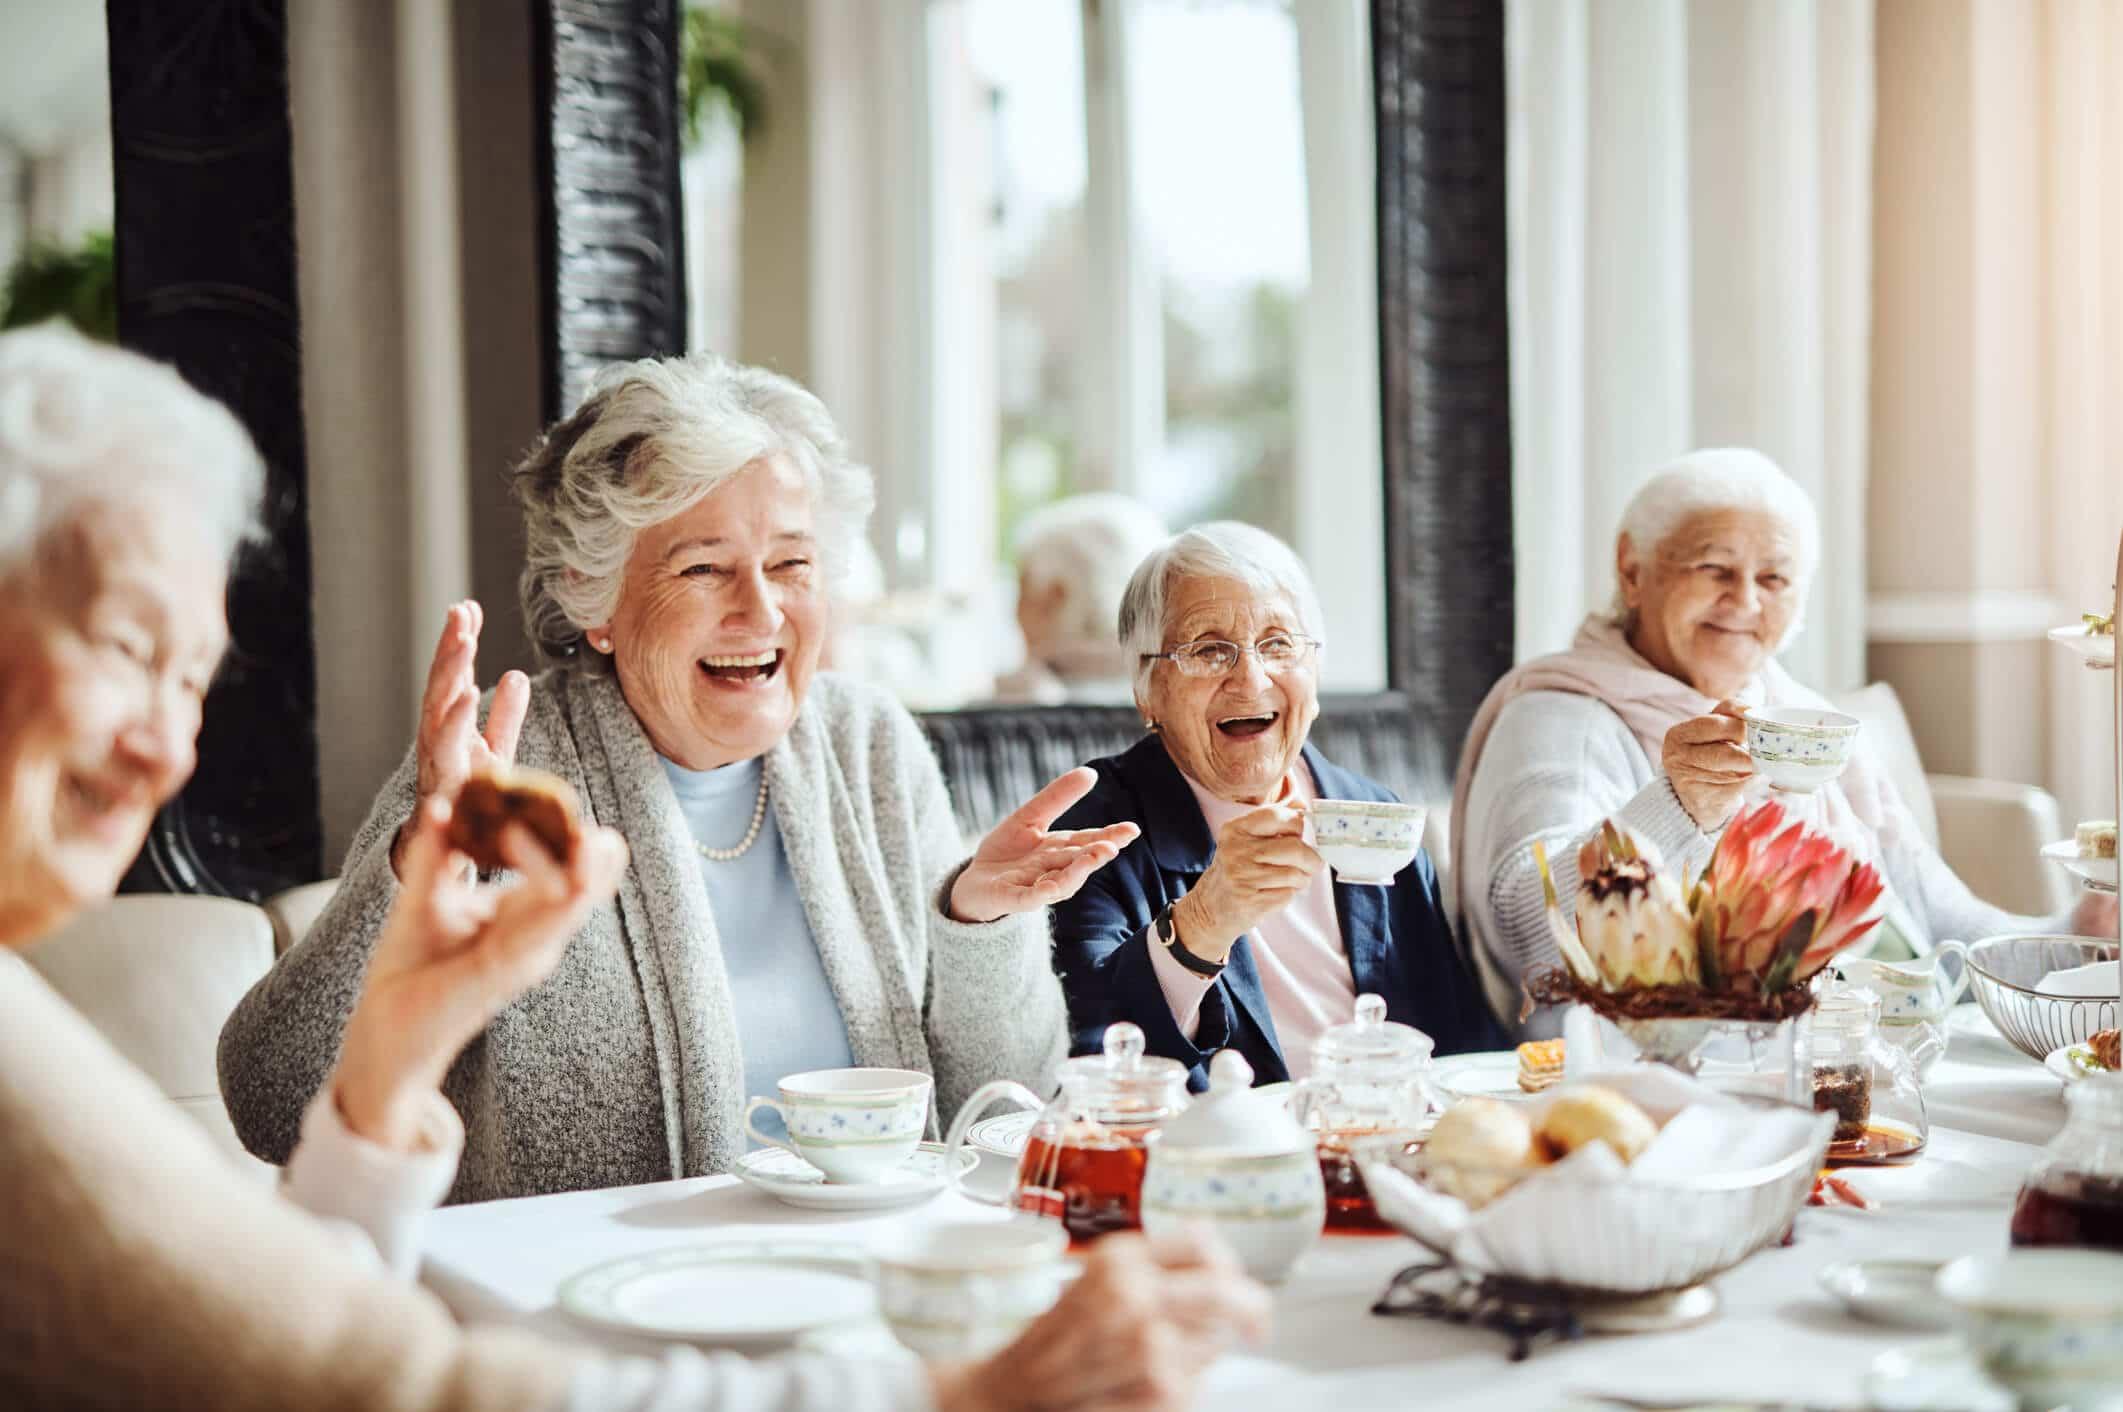 résidence senior personnes âgées habitats vêtements